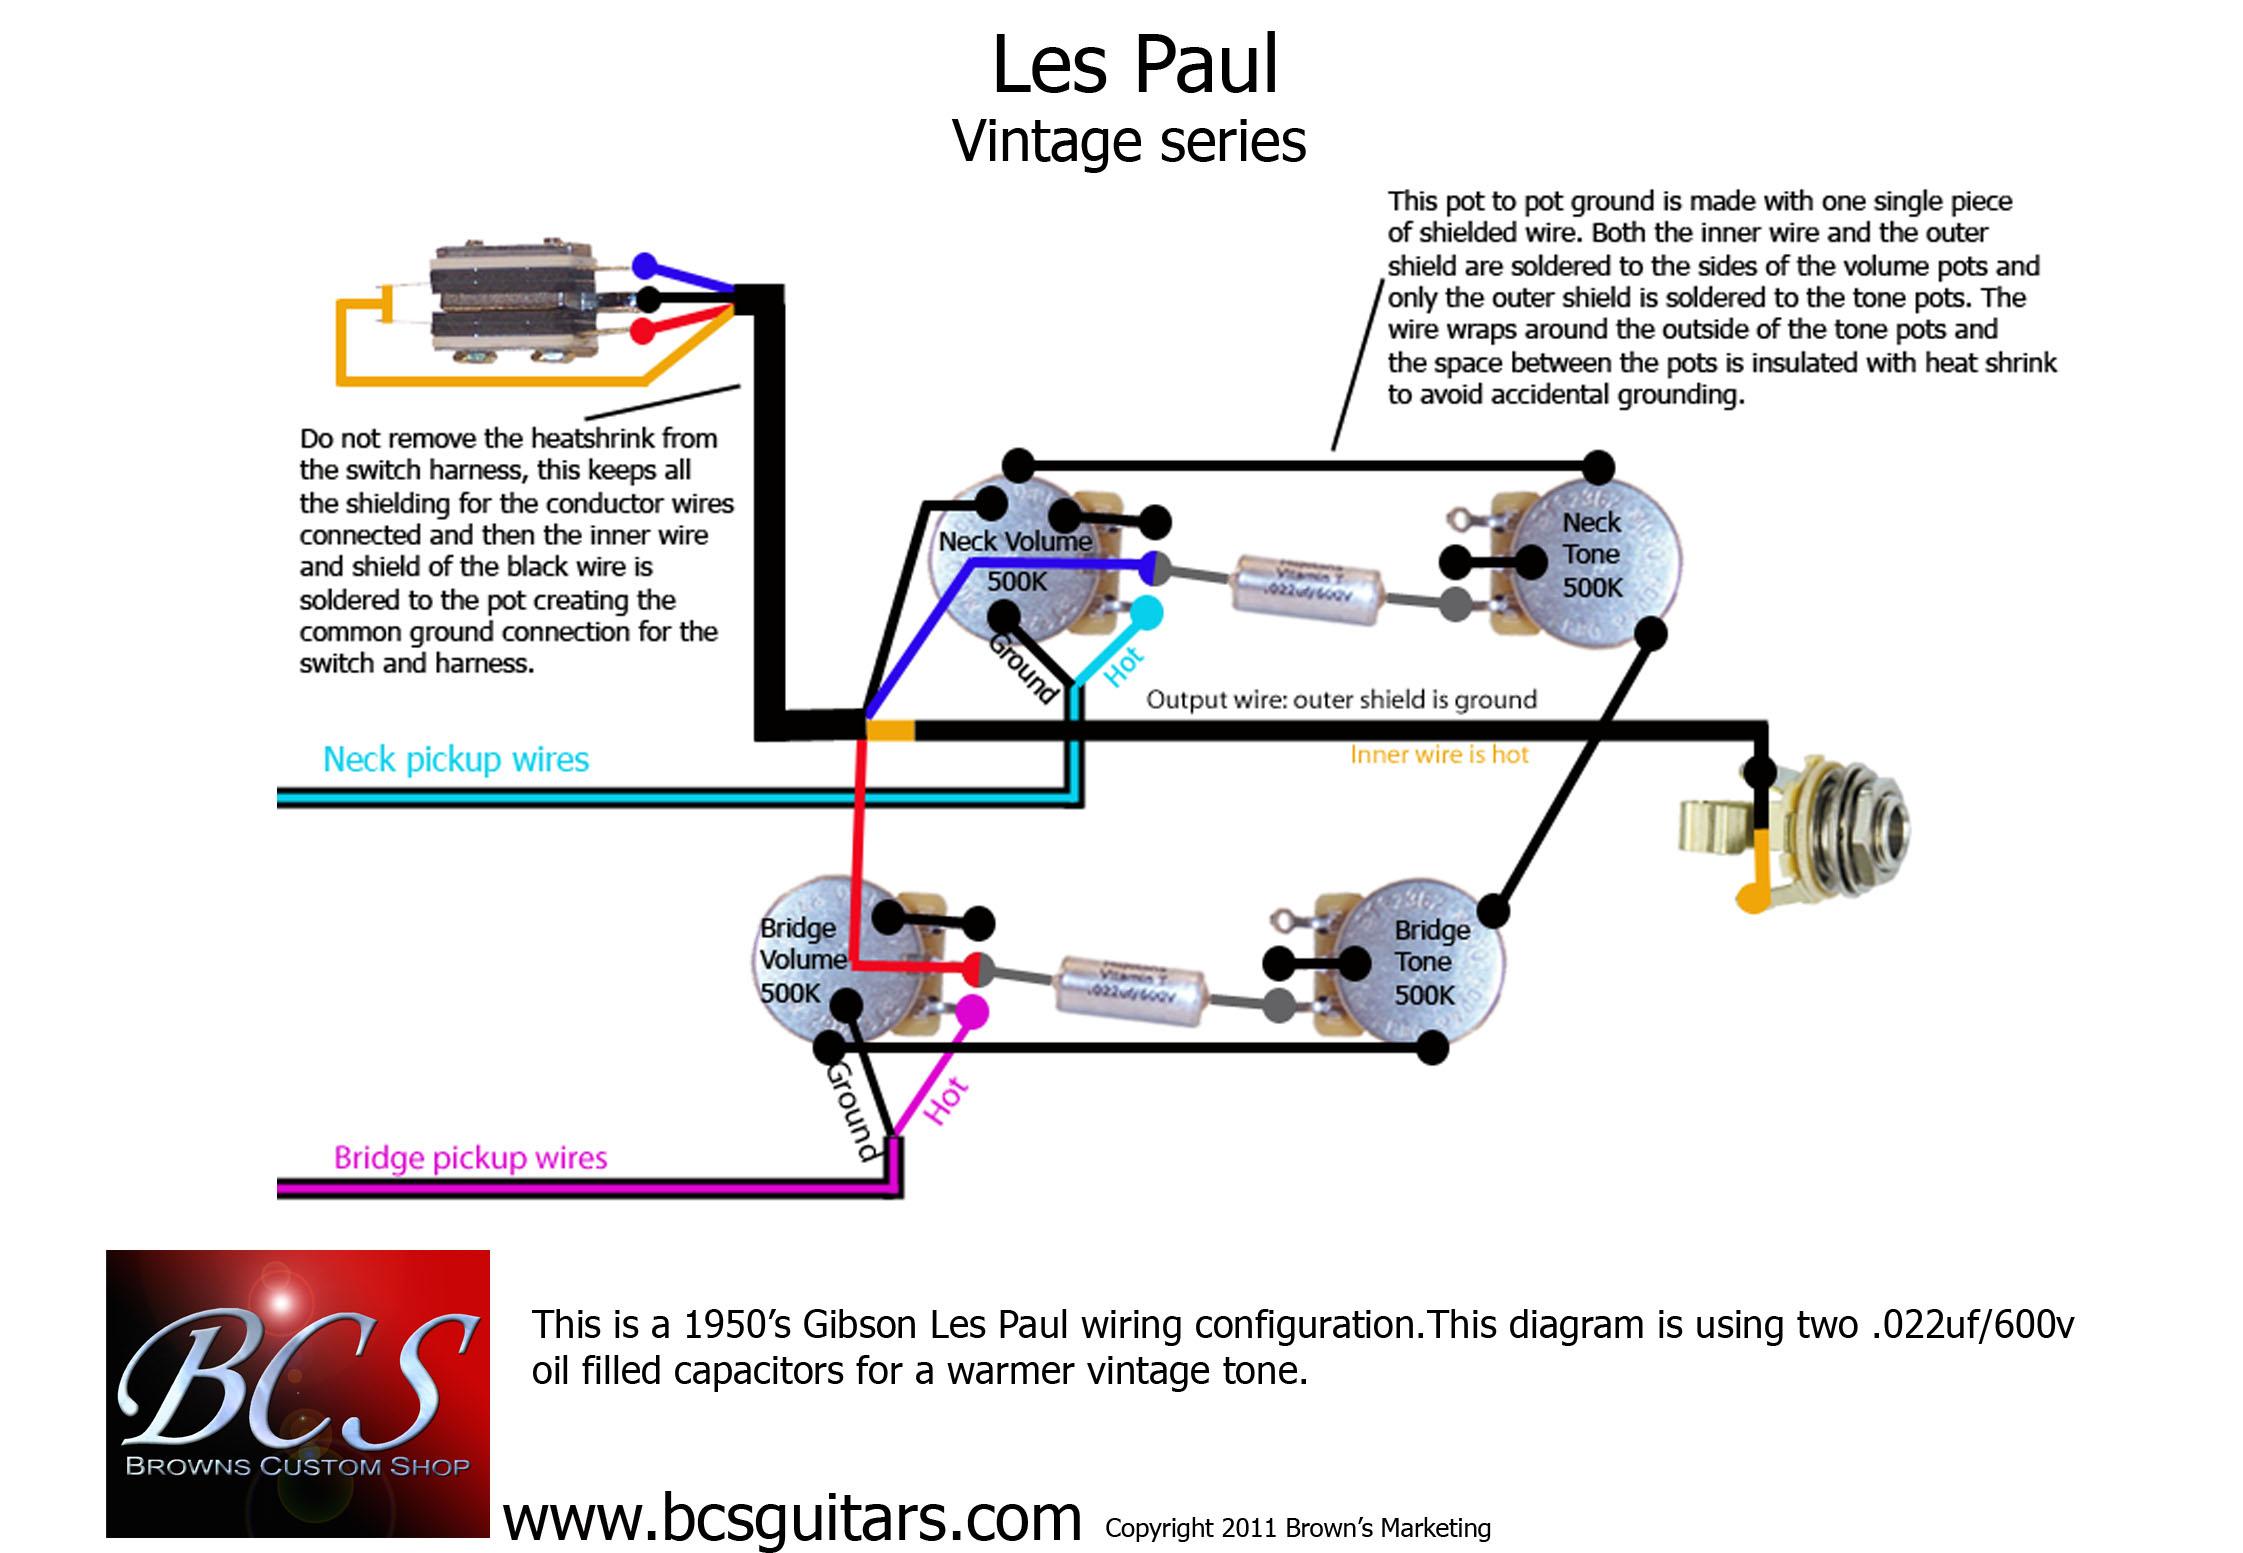 Epiphone Les Paul Guitar Wiring Diagram | Wiring Diagram - Epiphone Les Paul Wiring Diagram